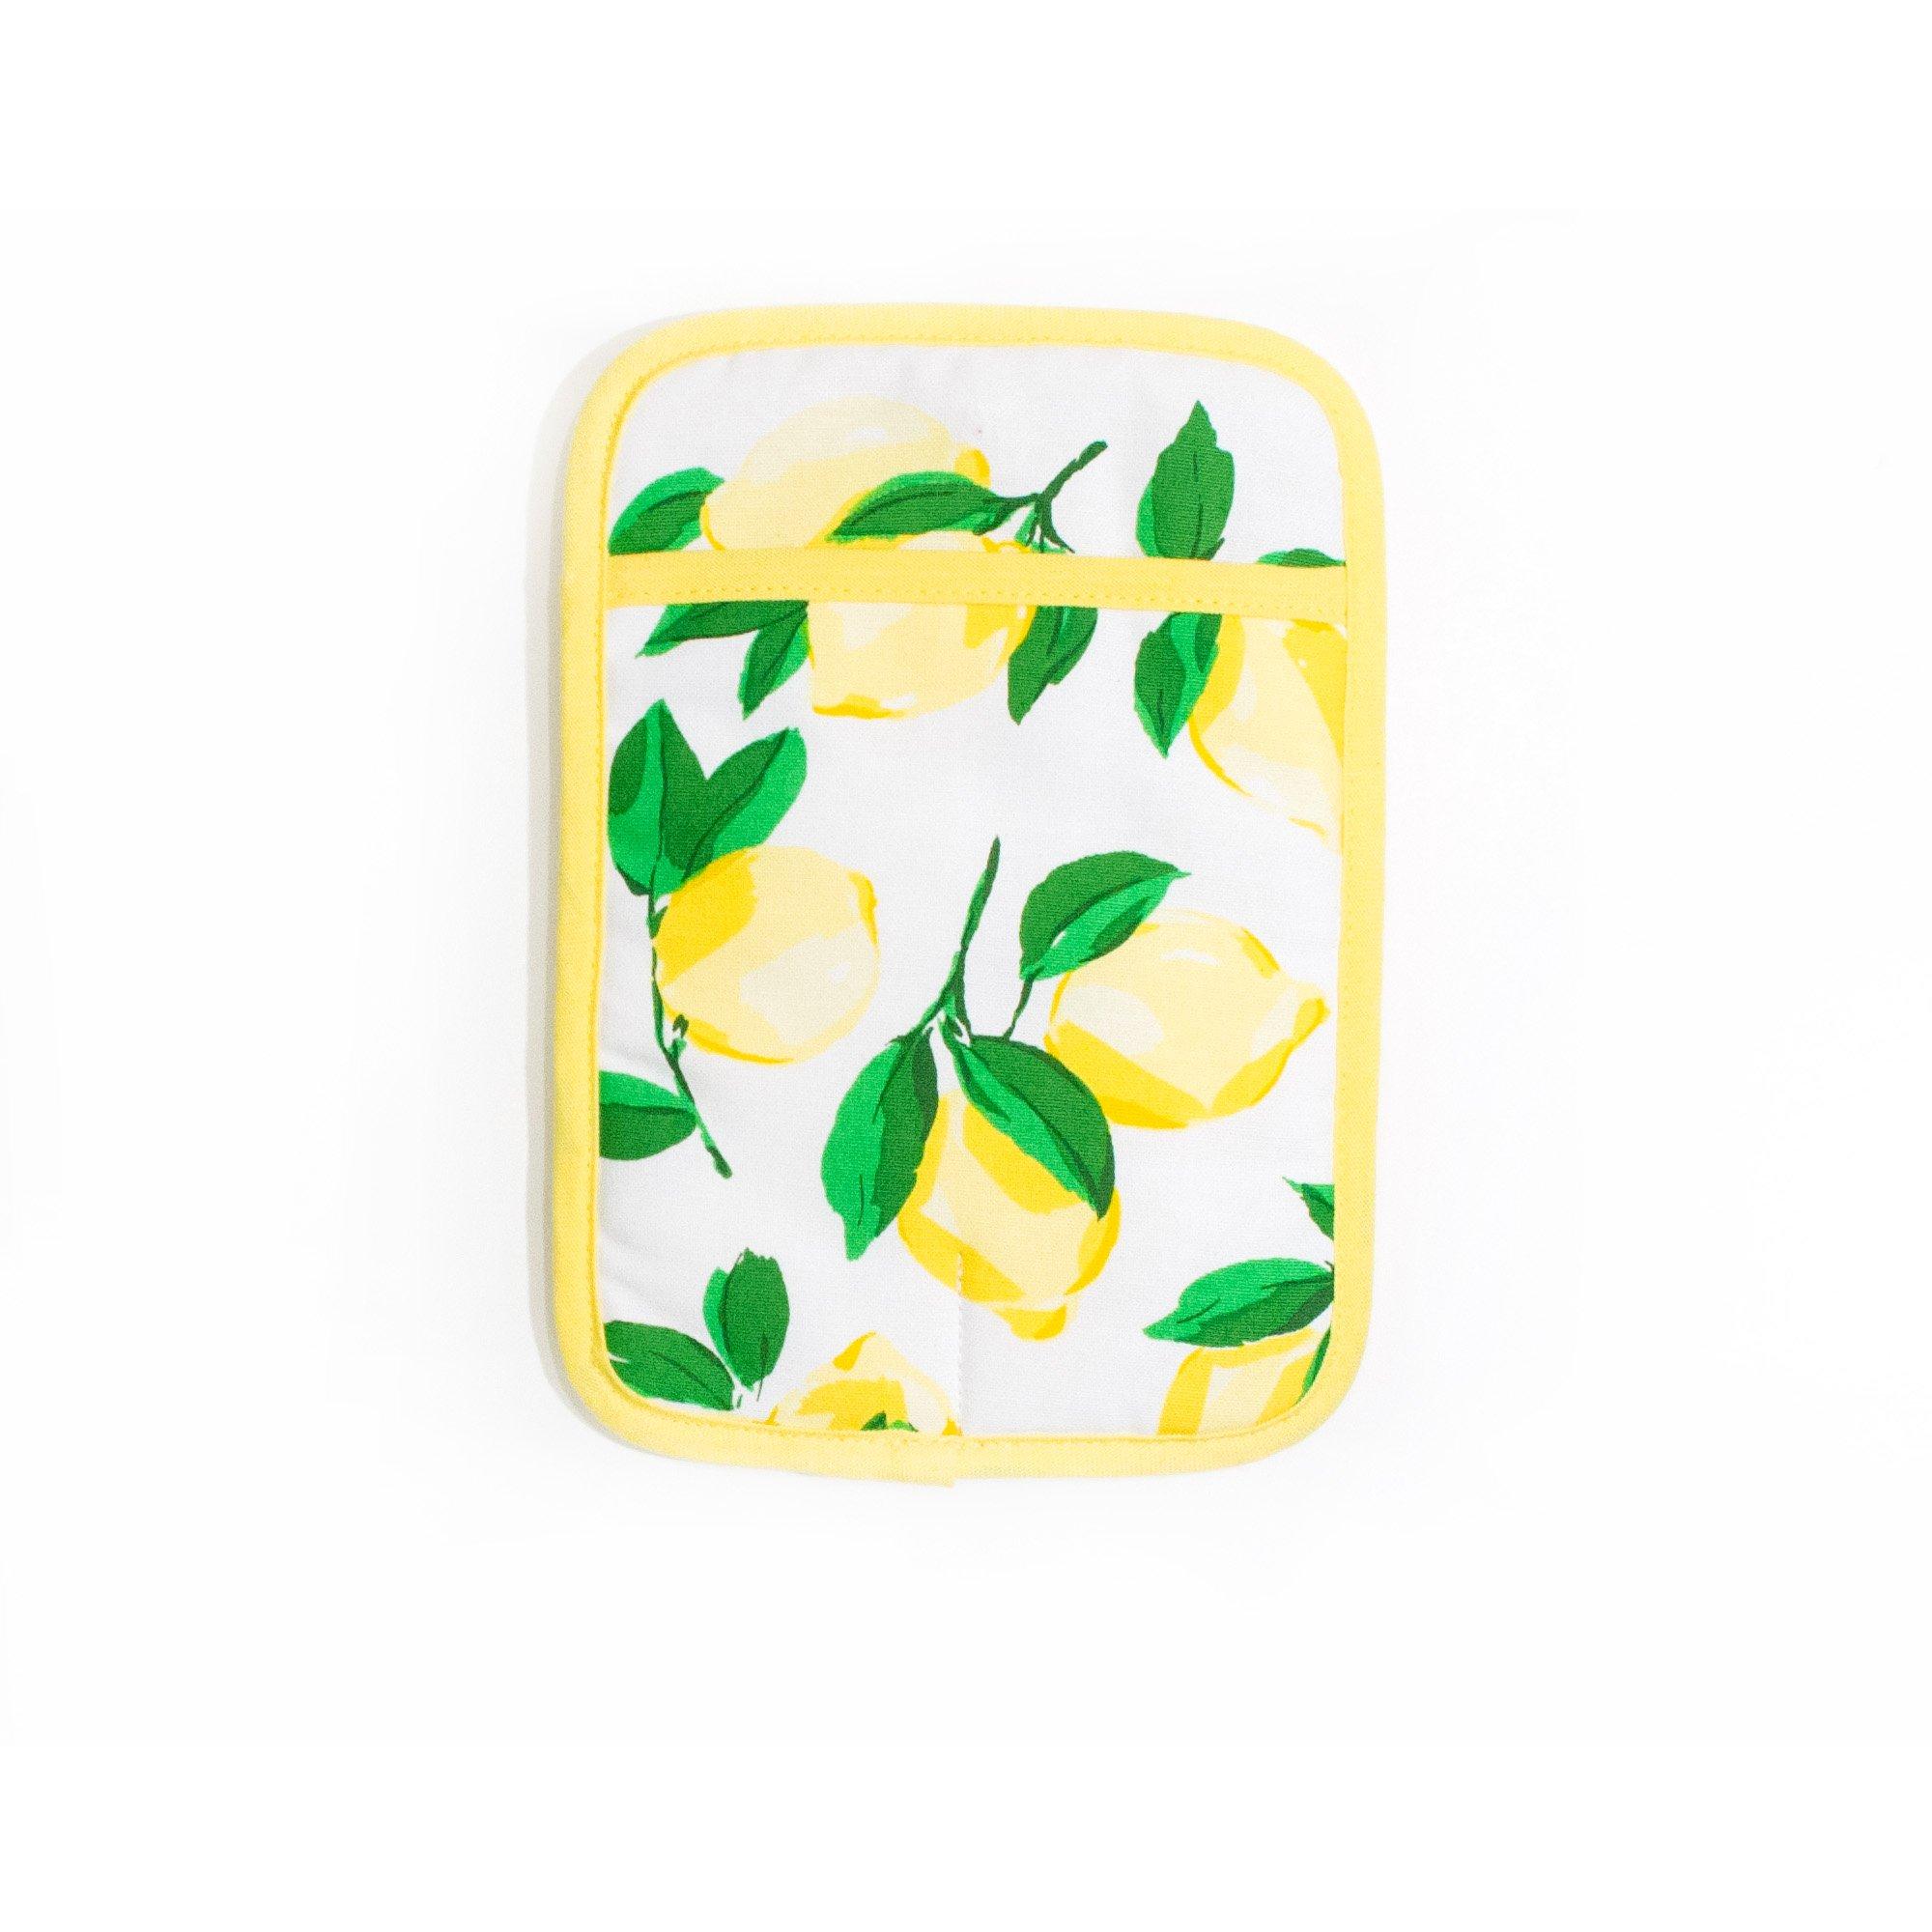 Kate Spade Make Lemonade Multi Pot Holder 7x10